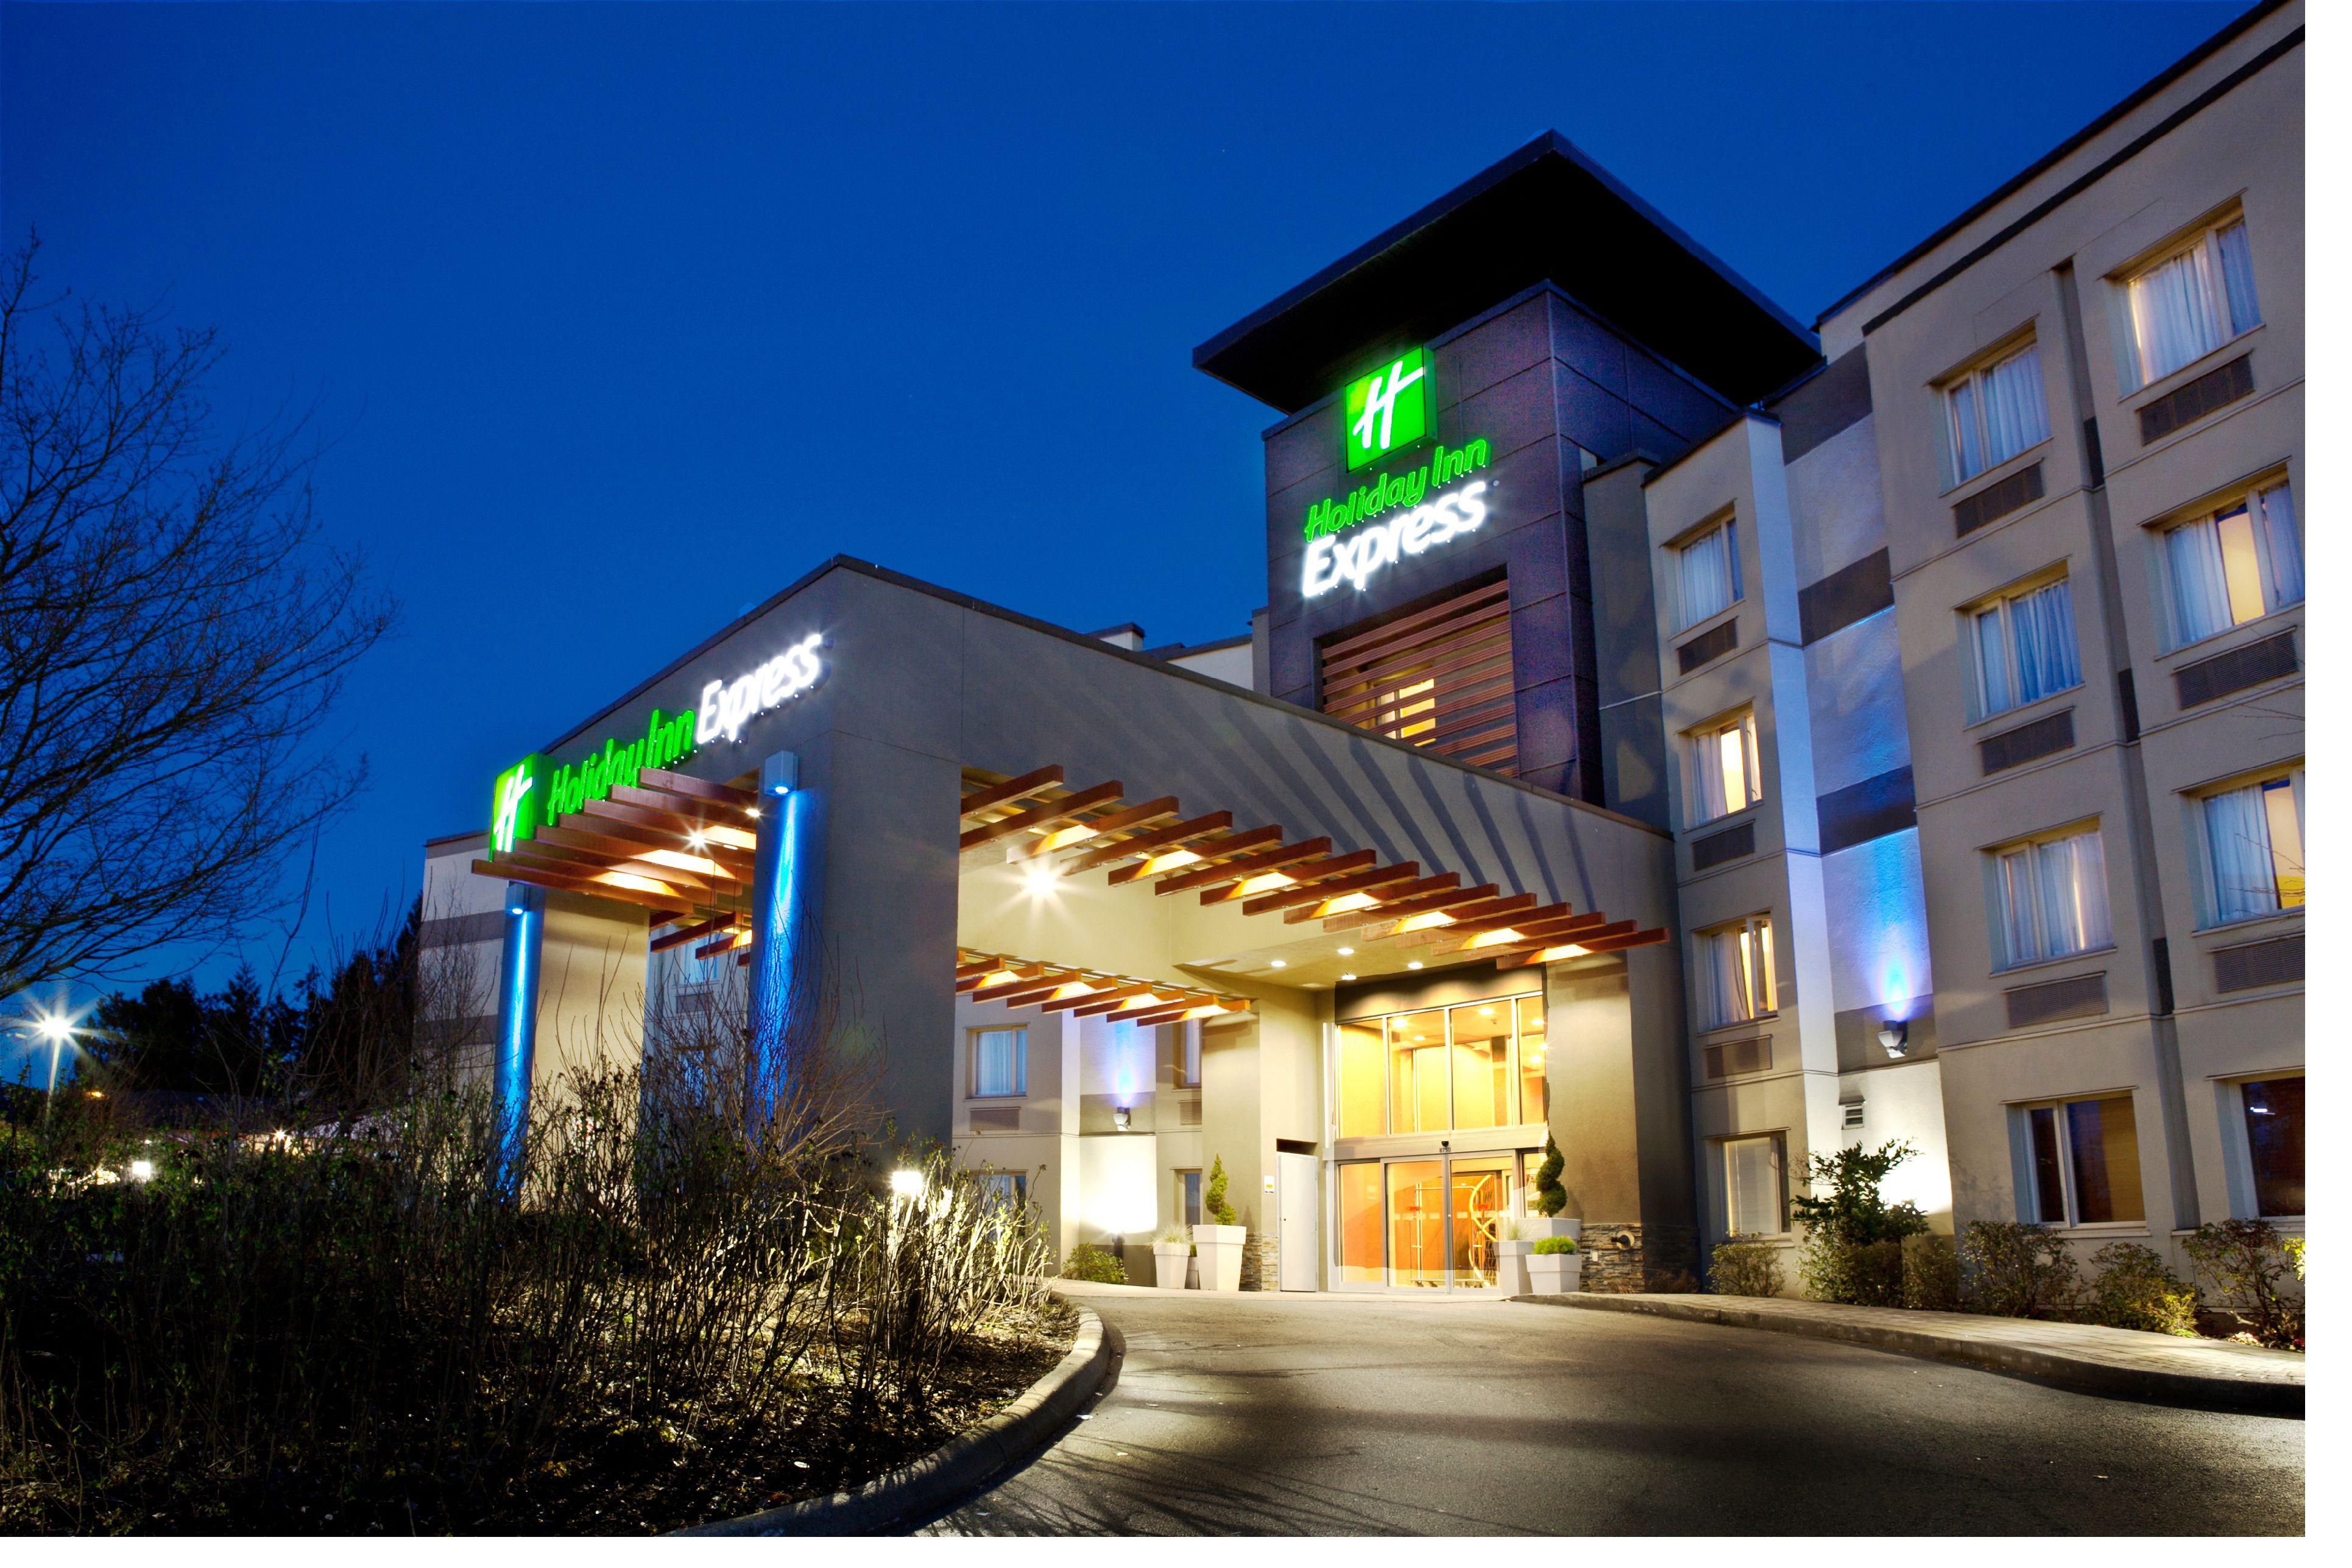 Holiday Inn Express & Suites Lancaster-Lititz image 5